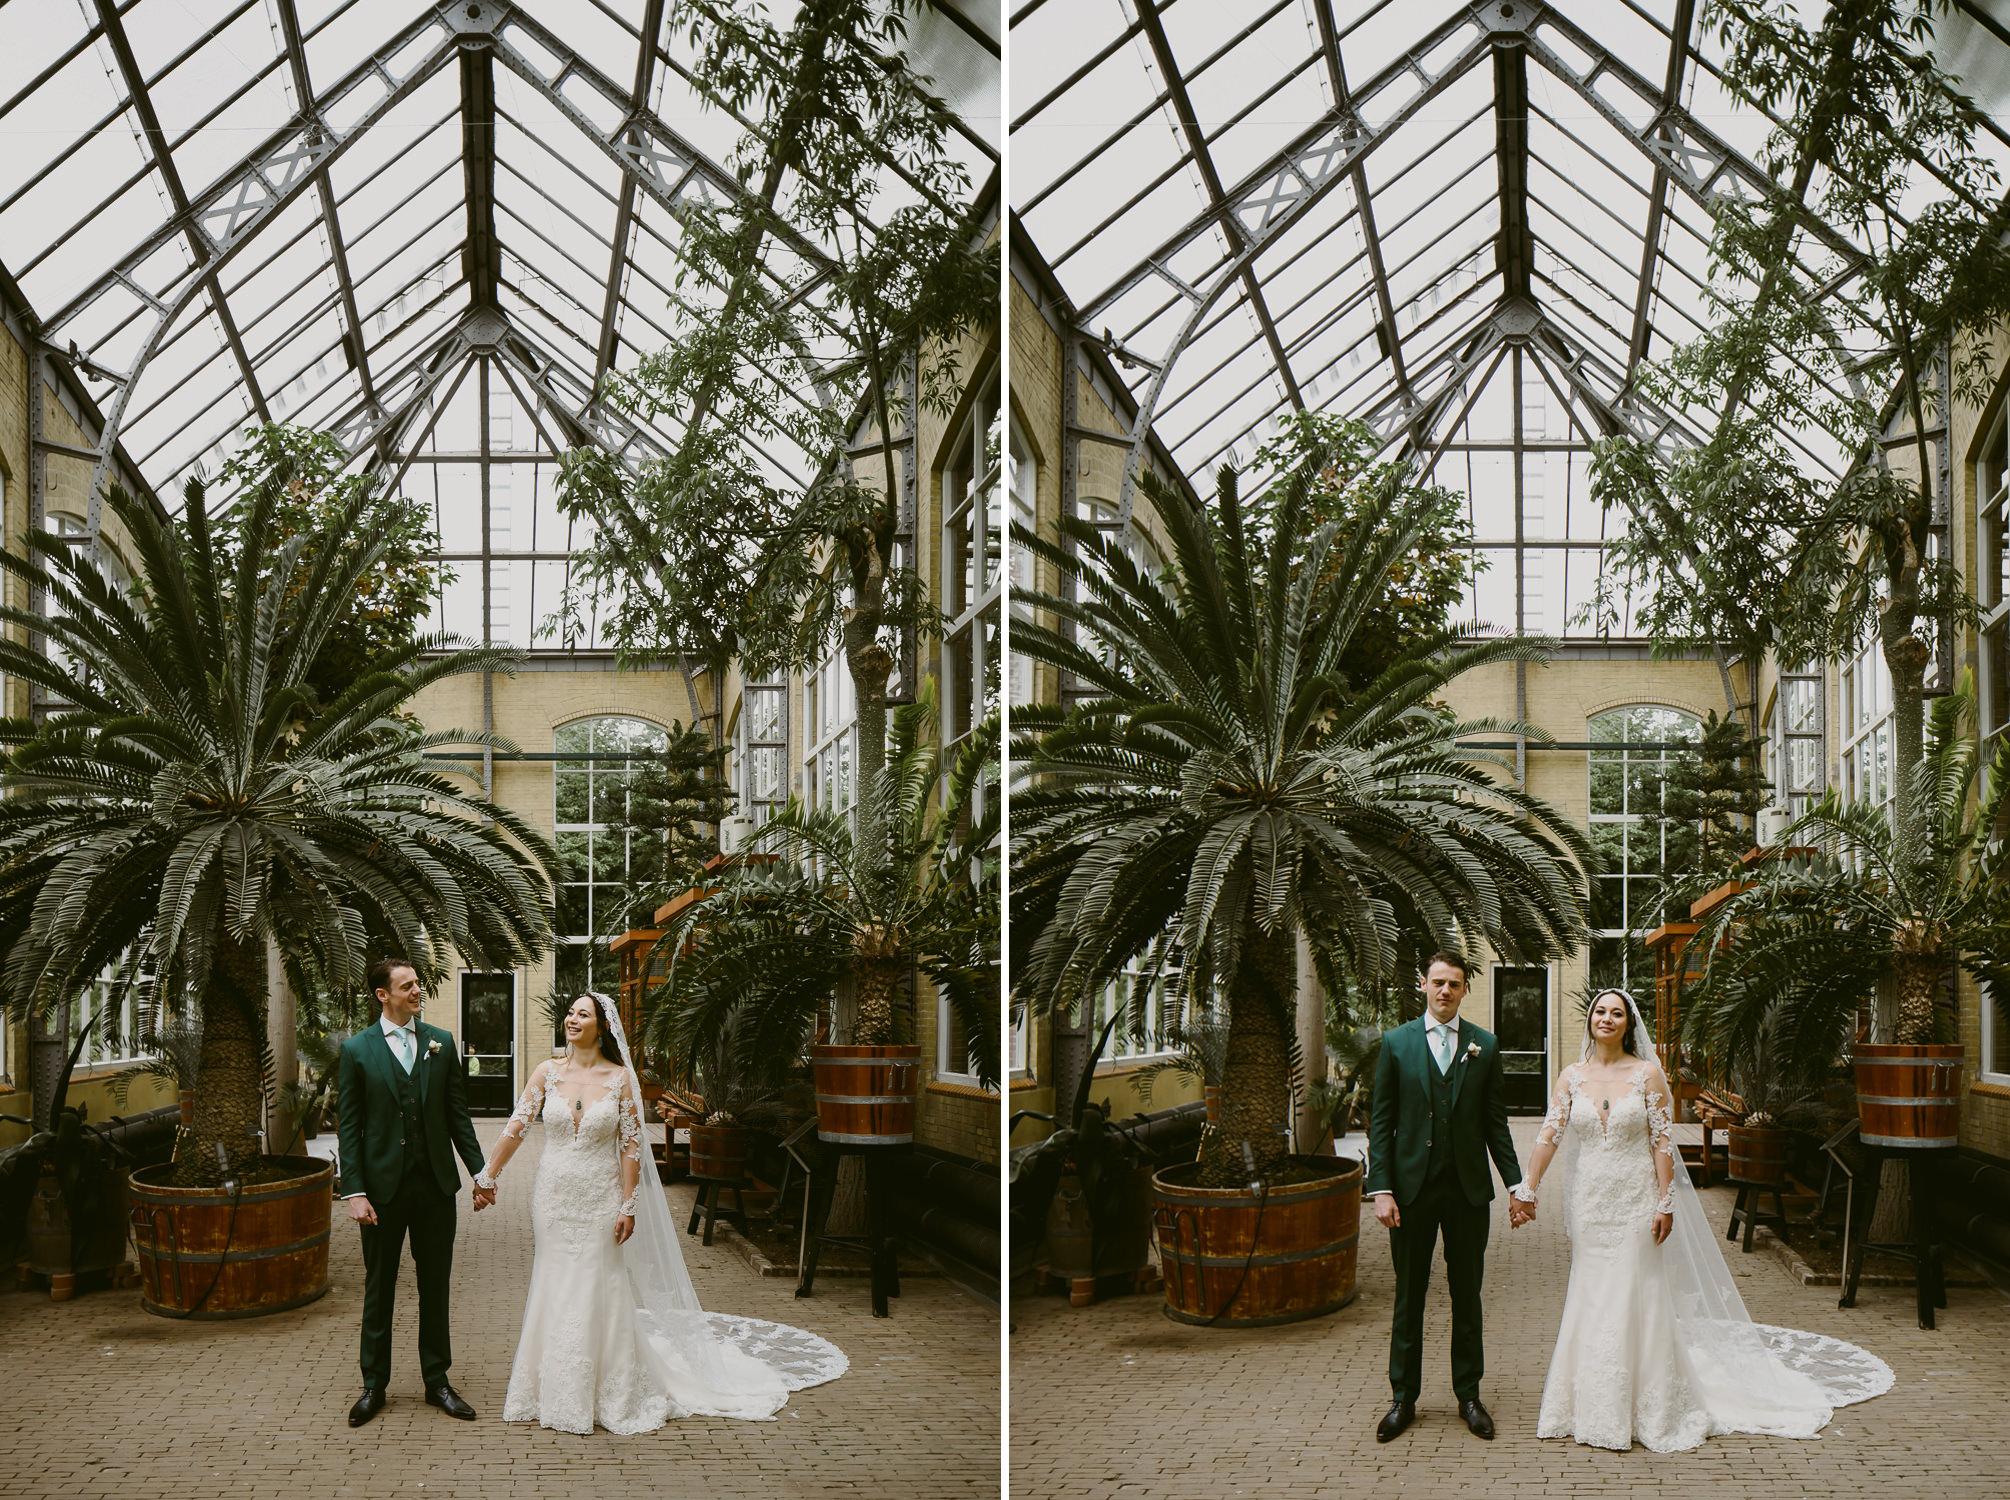 amsterdam wedding photographer mark hadden at the hortus botanicus